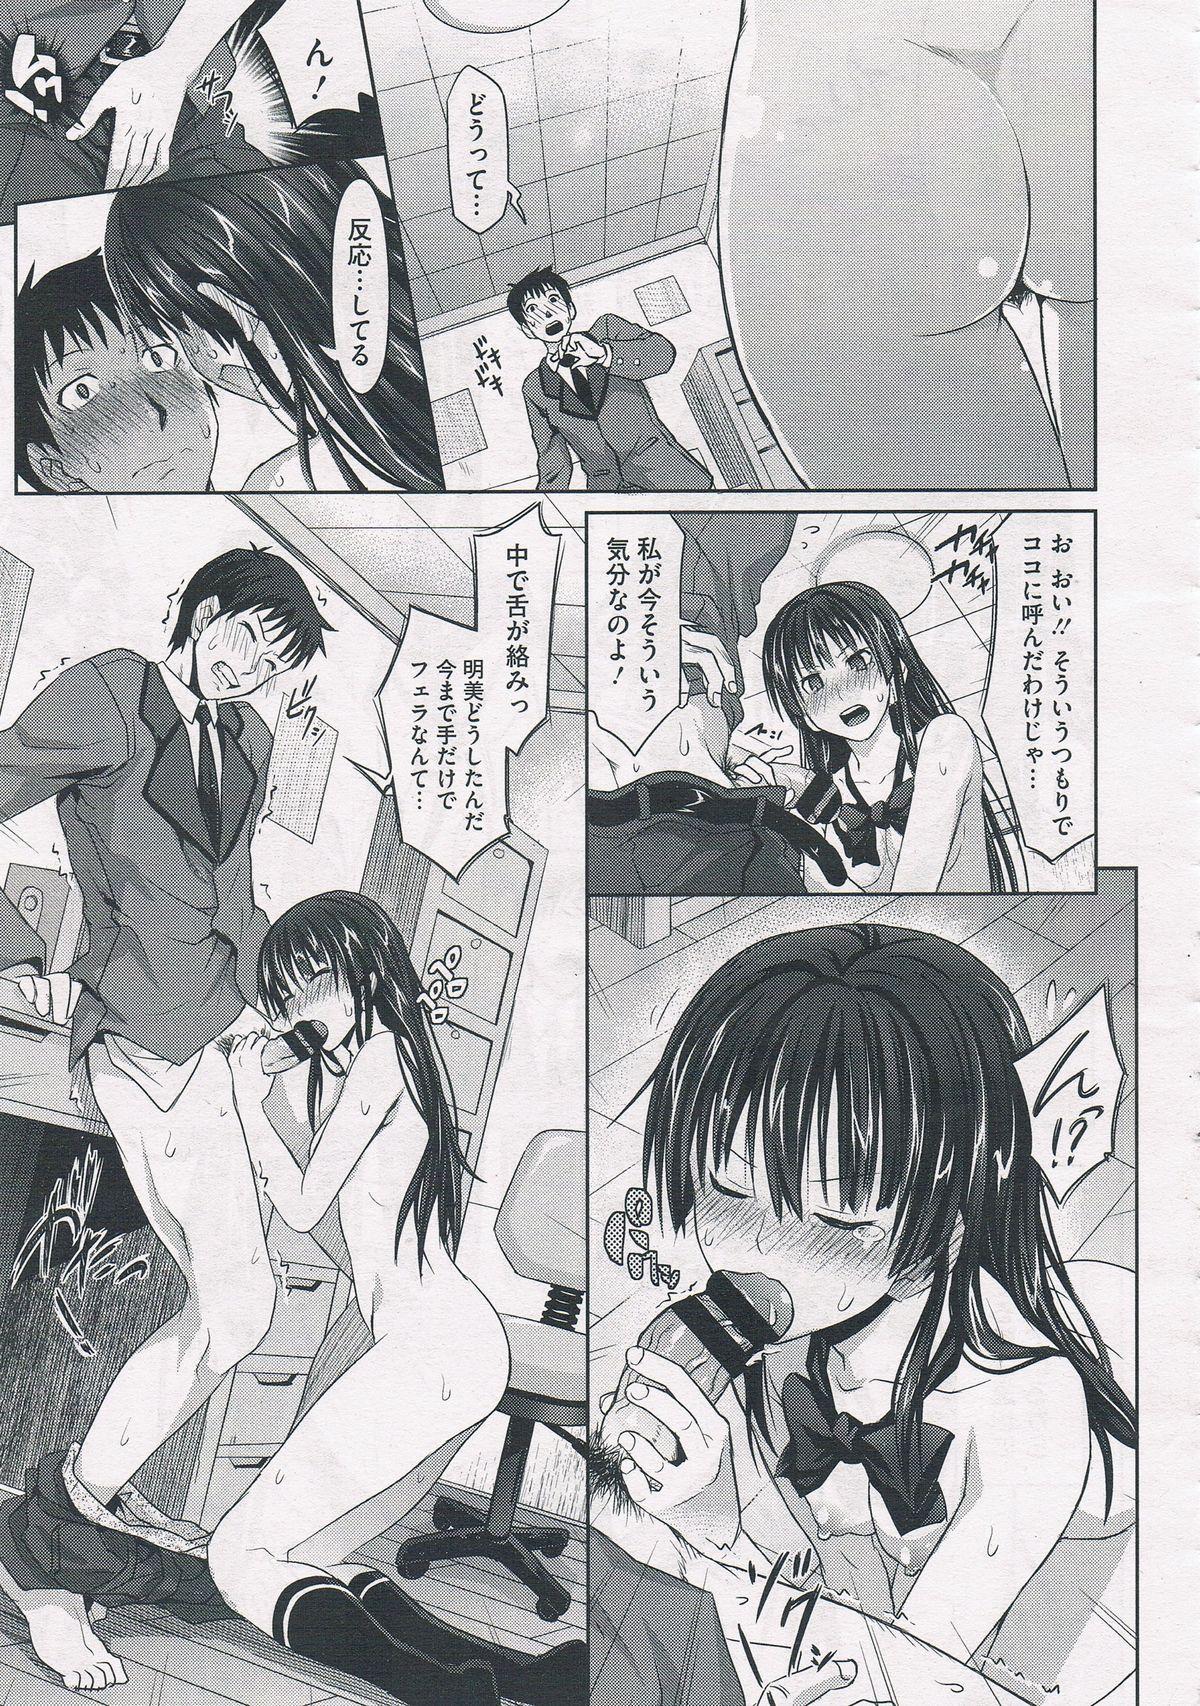 Migite no koibito COMIC Megastore 2012-07 12